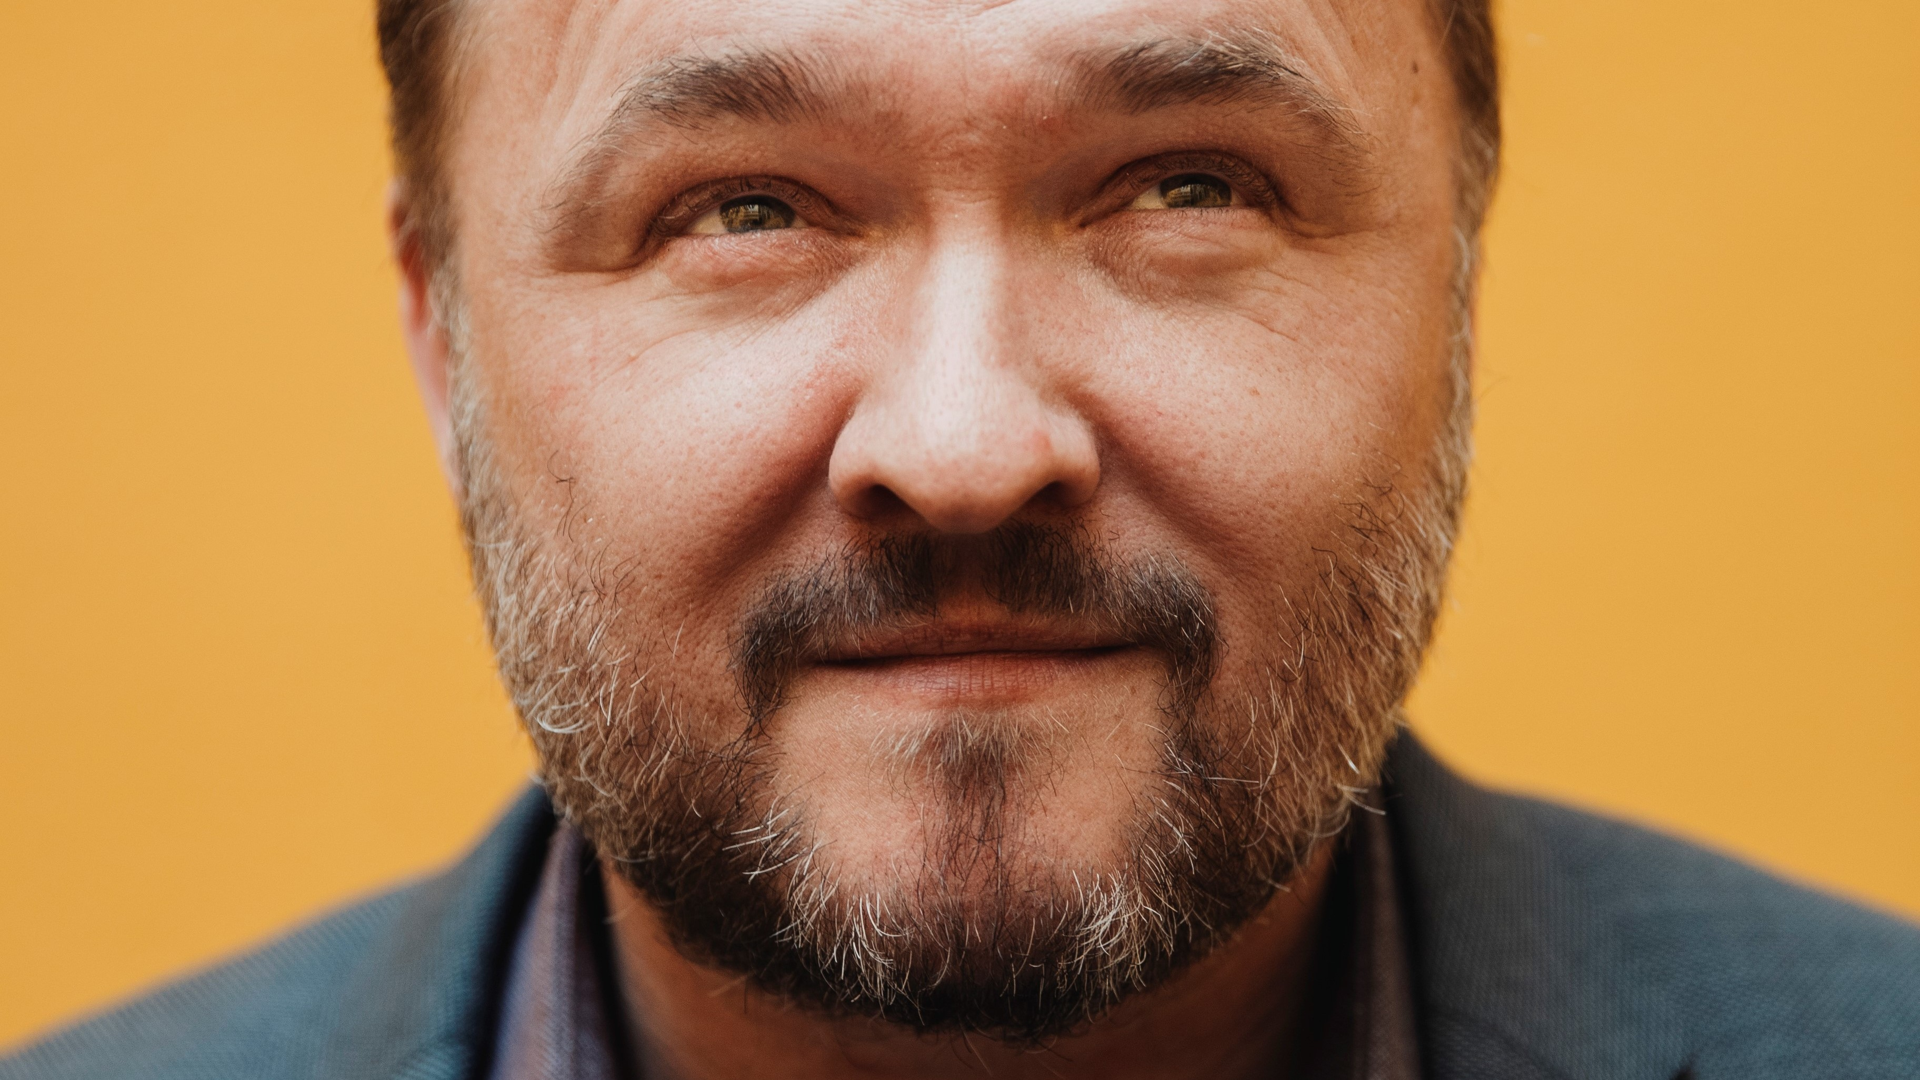 Dan Jørgensen i RÆSONs nye trykte nummer: Diskussionen om hockeystaven er blevet bevidst misforstået